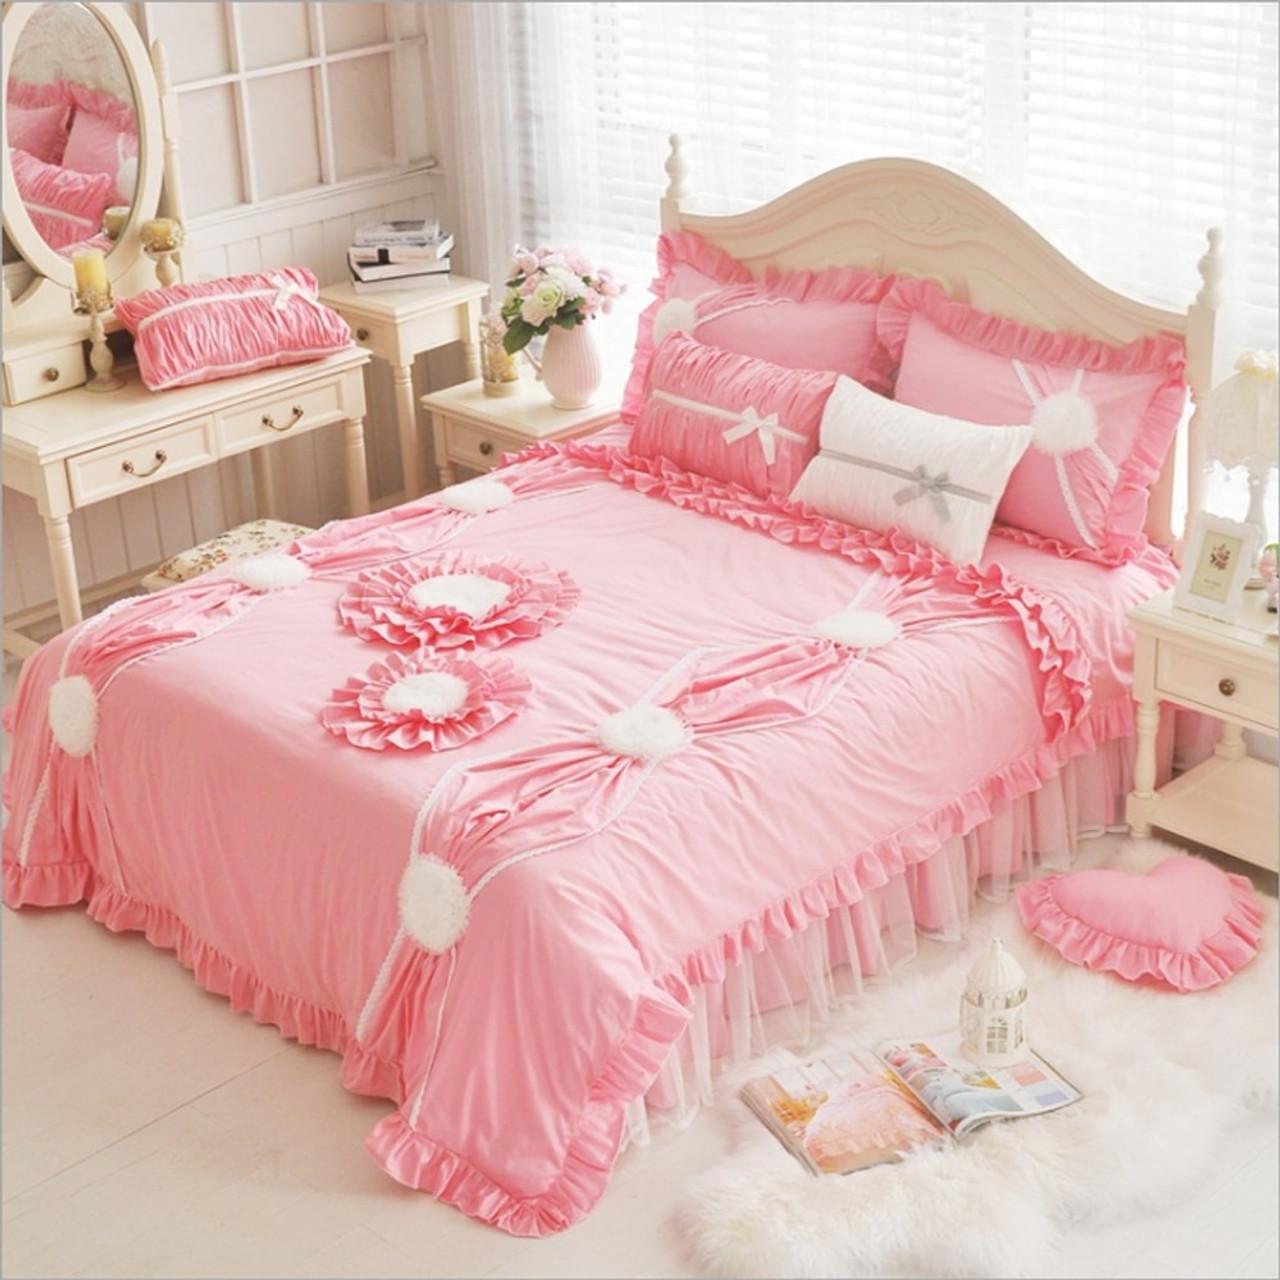 تقدم قفز ديكور New Bed Sheet Designs Loudounhorseassociation Org